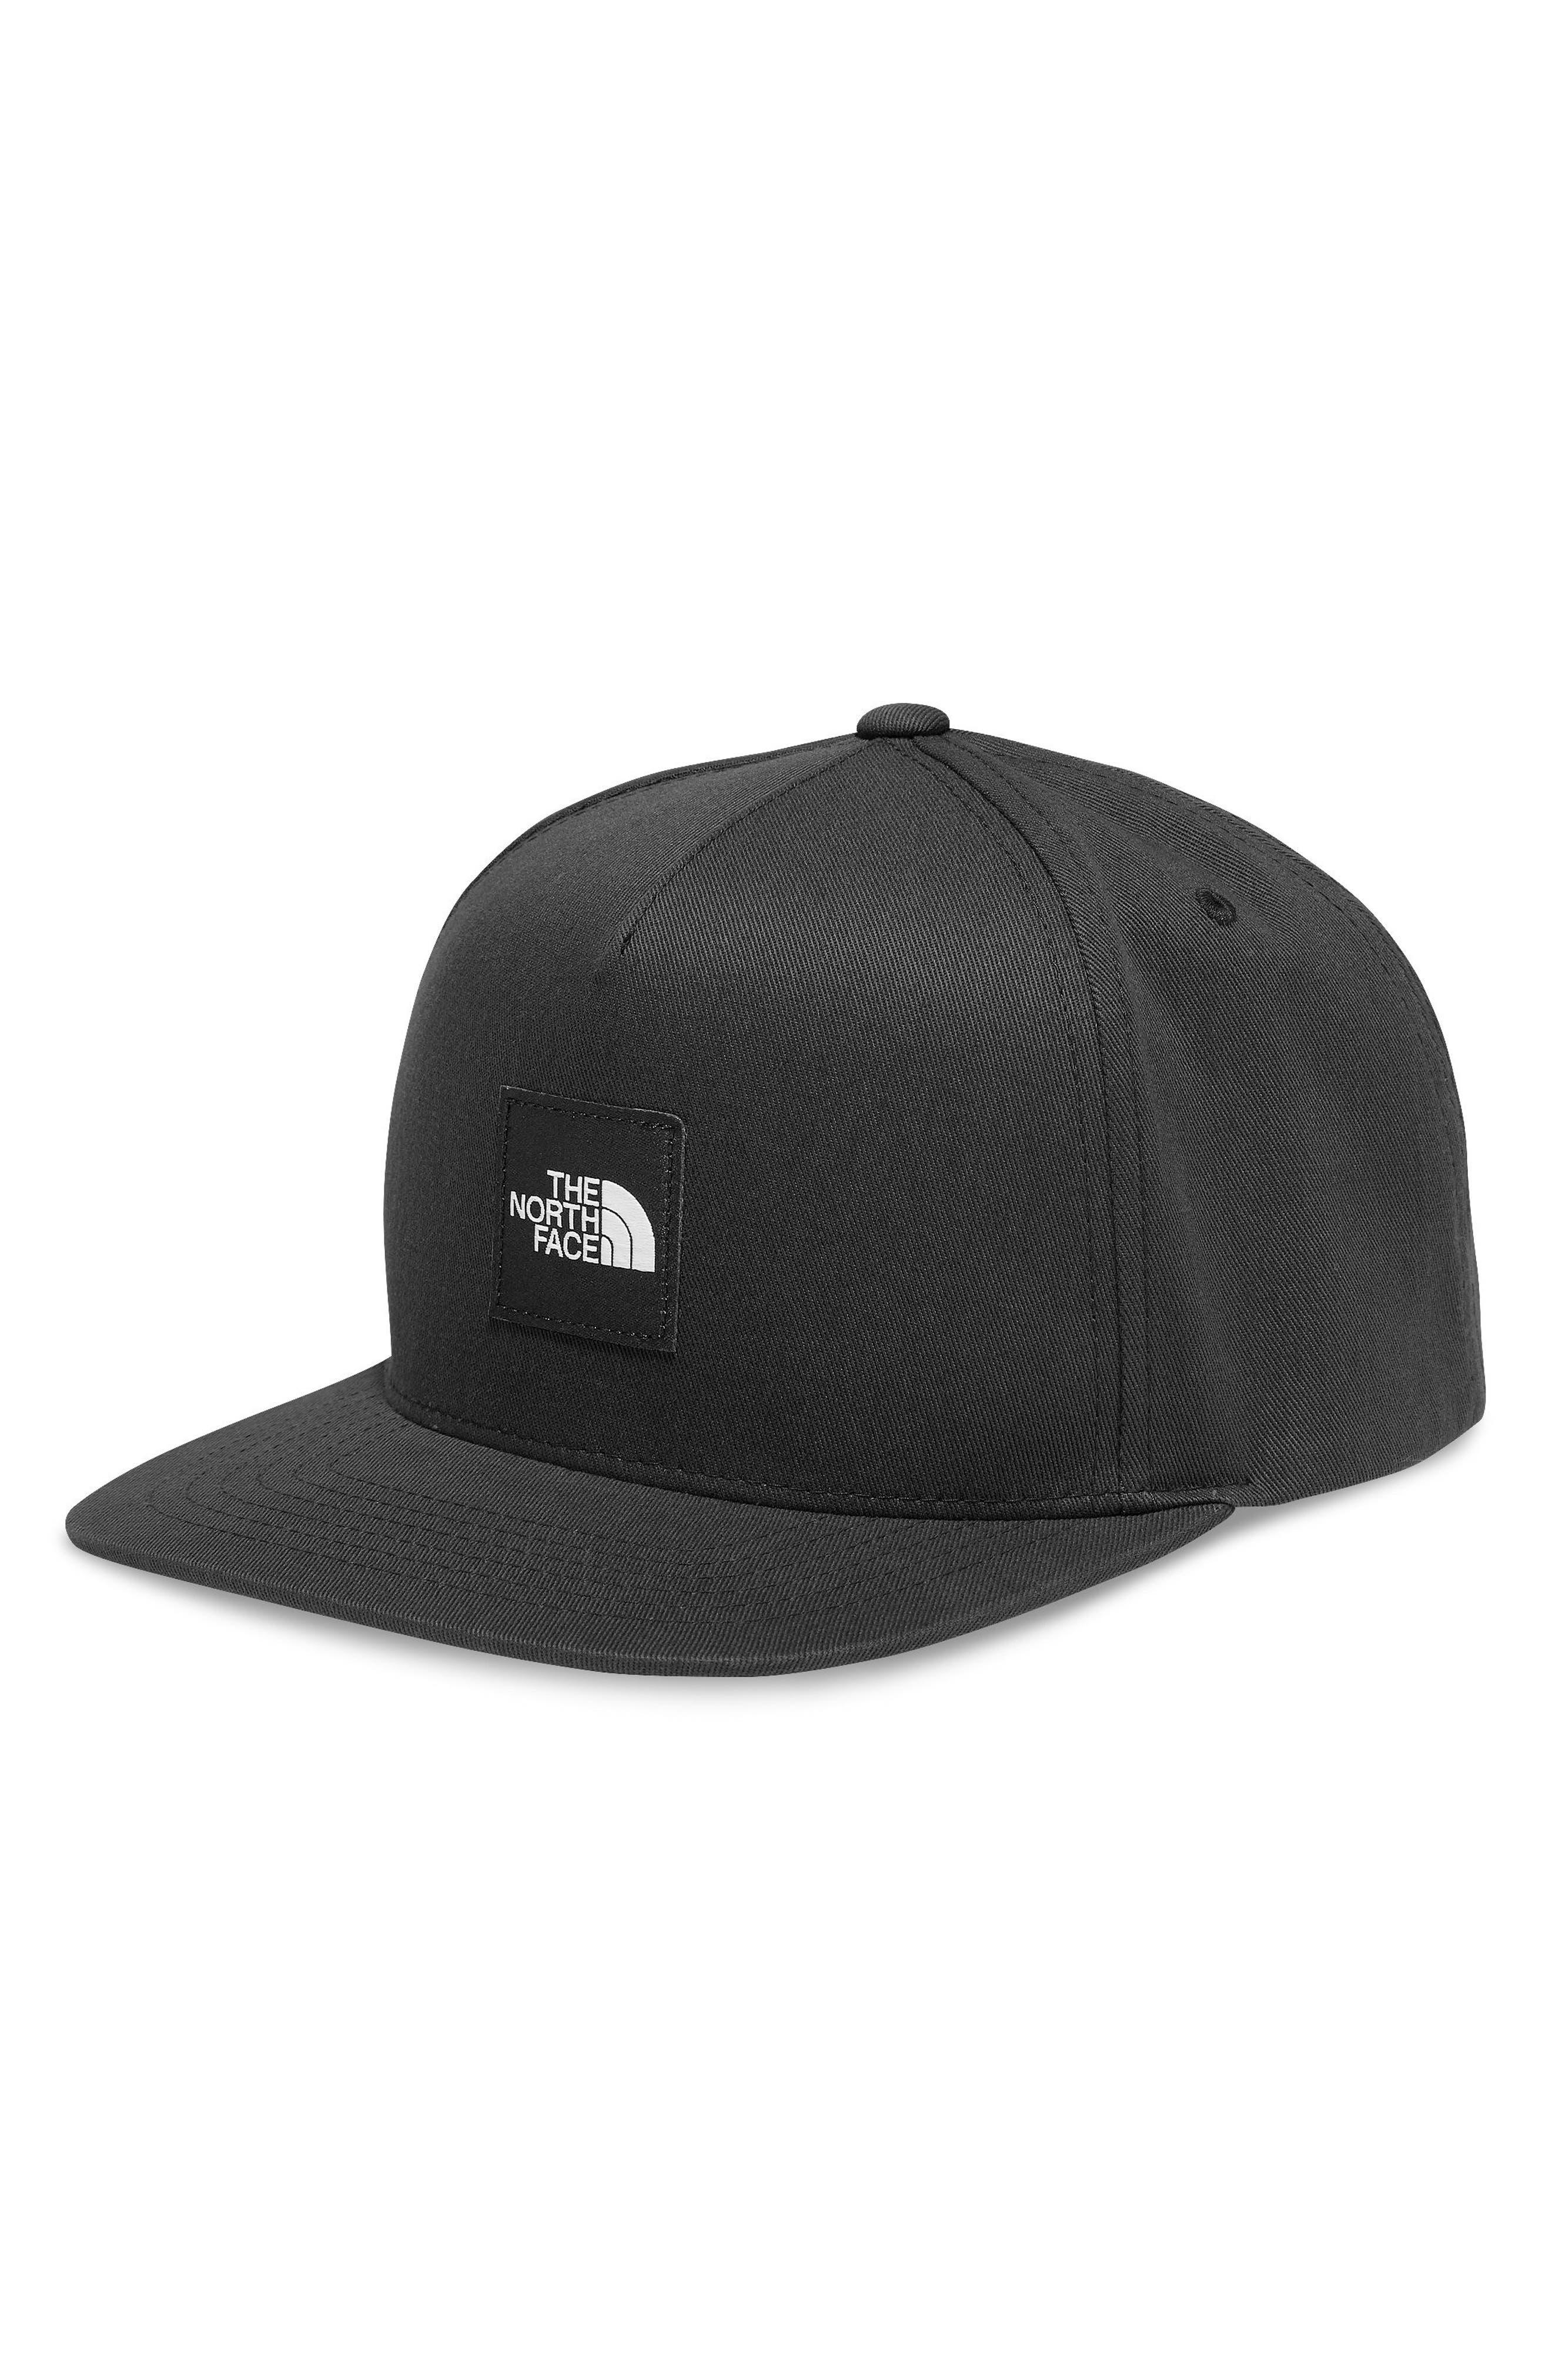 Street Baseball Cap,                             Main thumbnail 1, color,                             TNF BLACK/ TNF BLACK